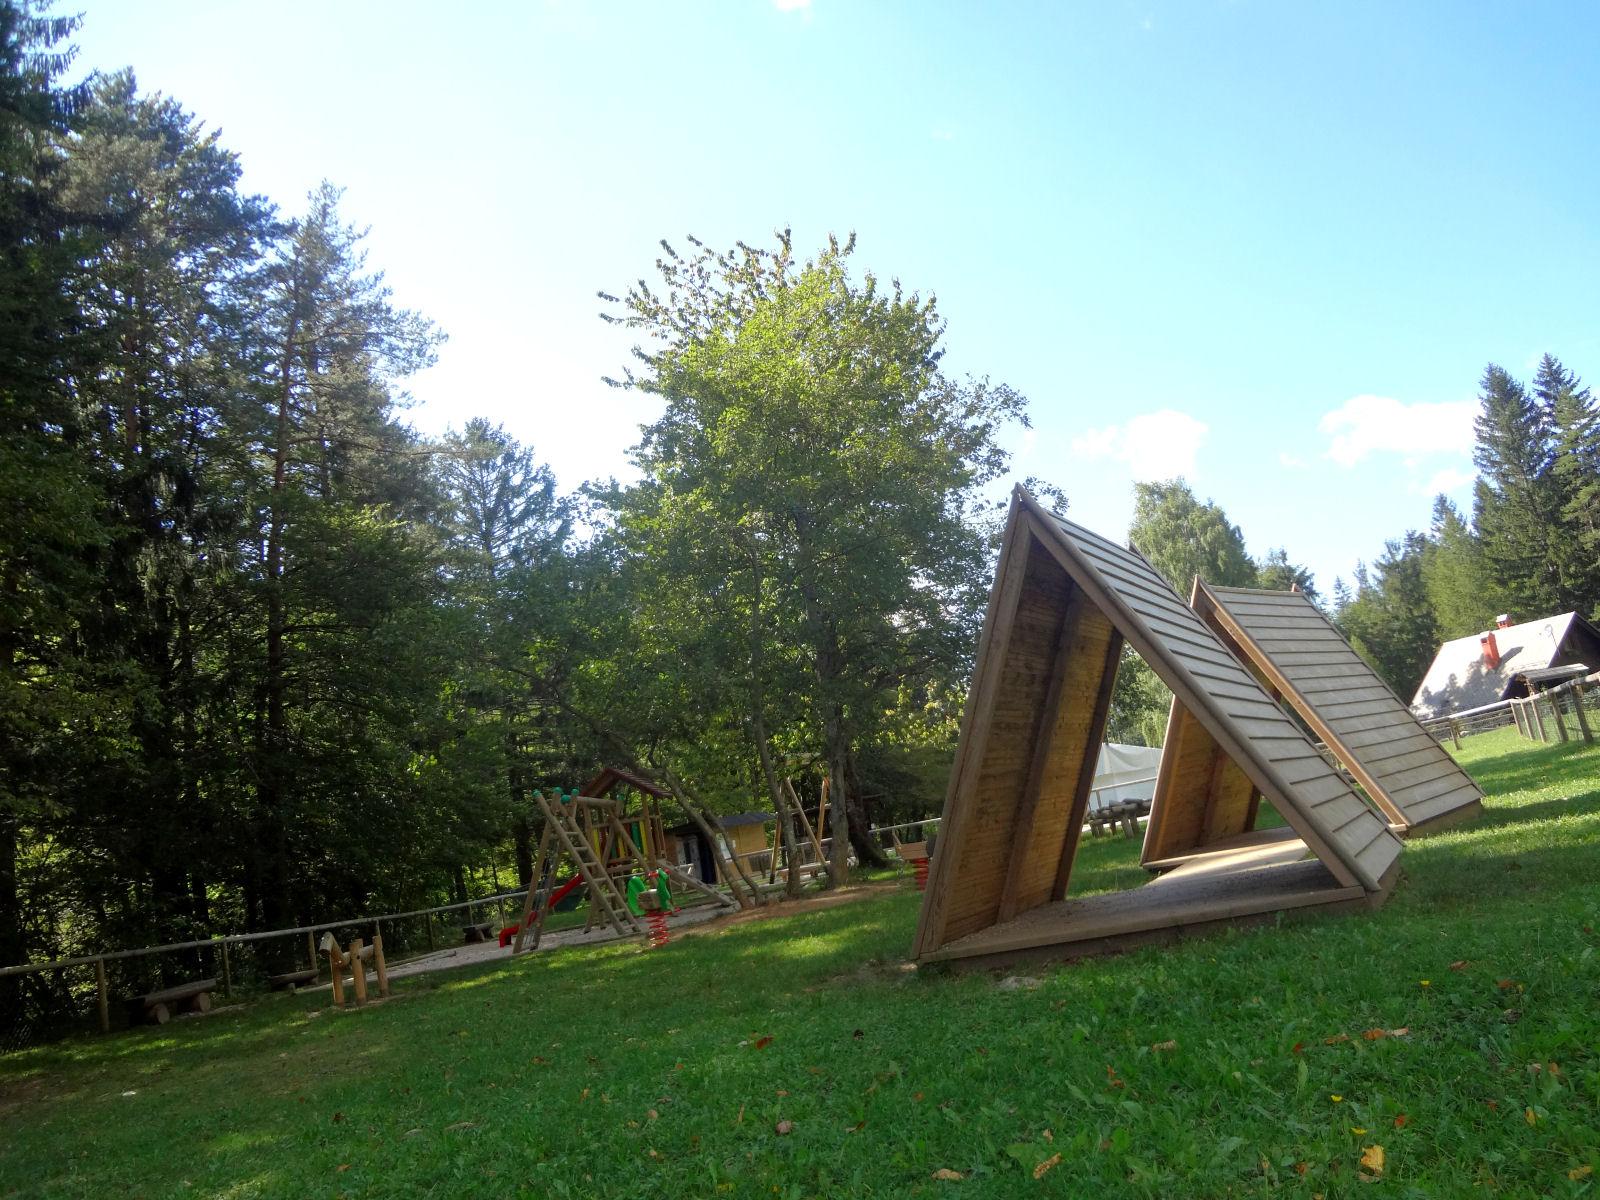 Children's playground at the Zavrsnica recreation park